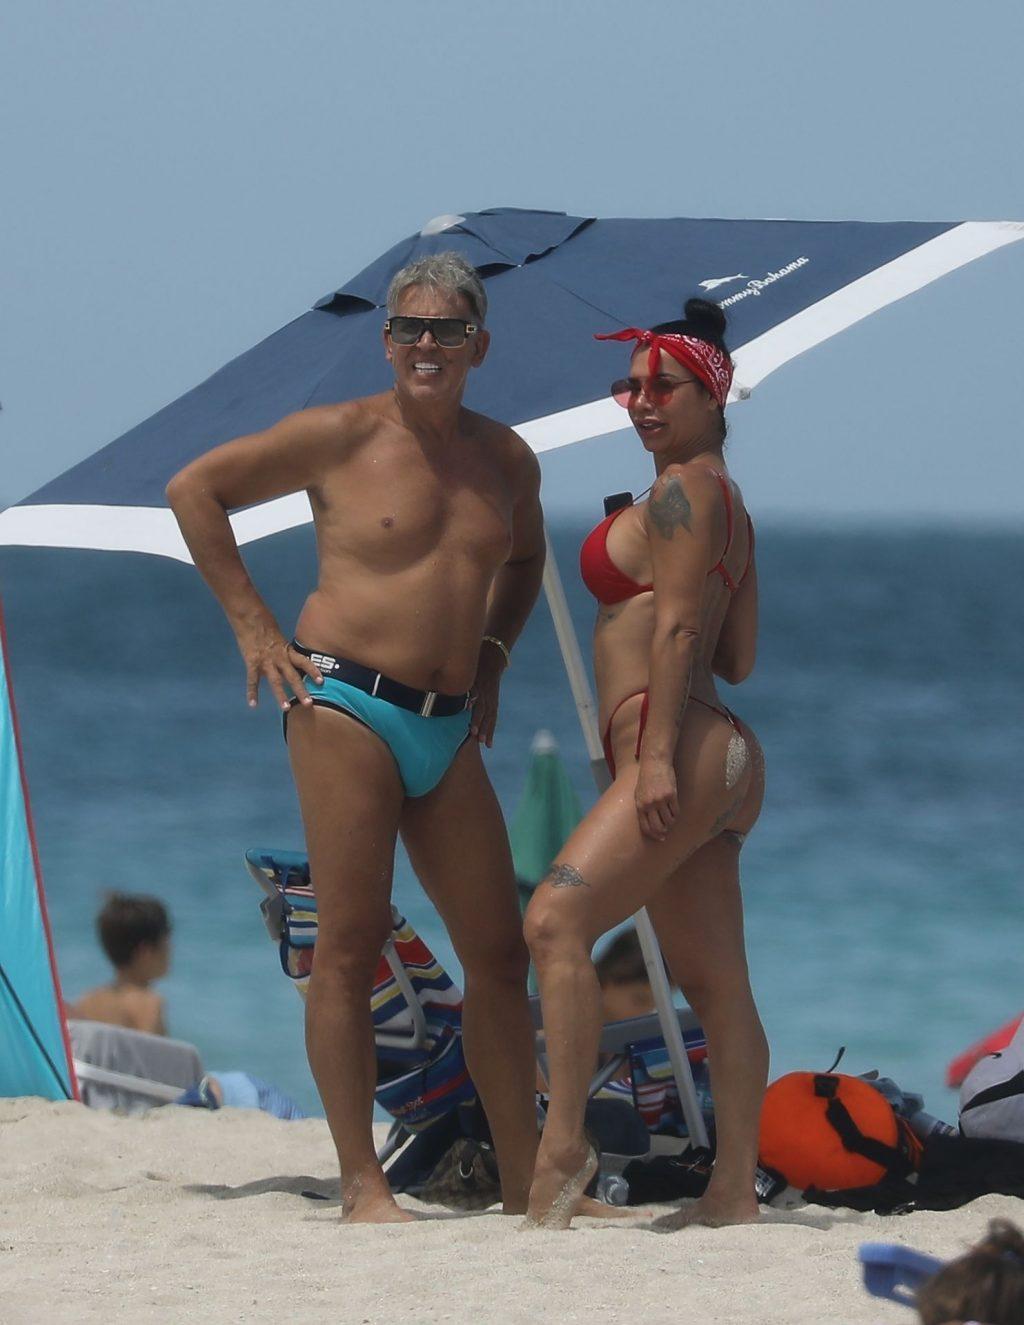 Lis Vega Displays Her Sexy Body on the Beach (72 Photos)